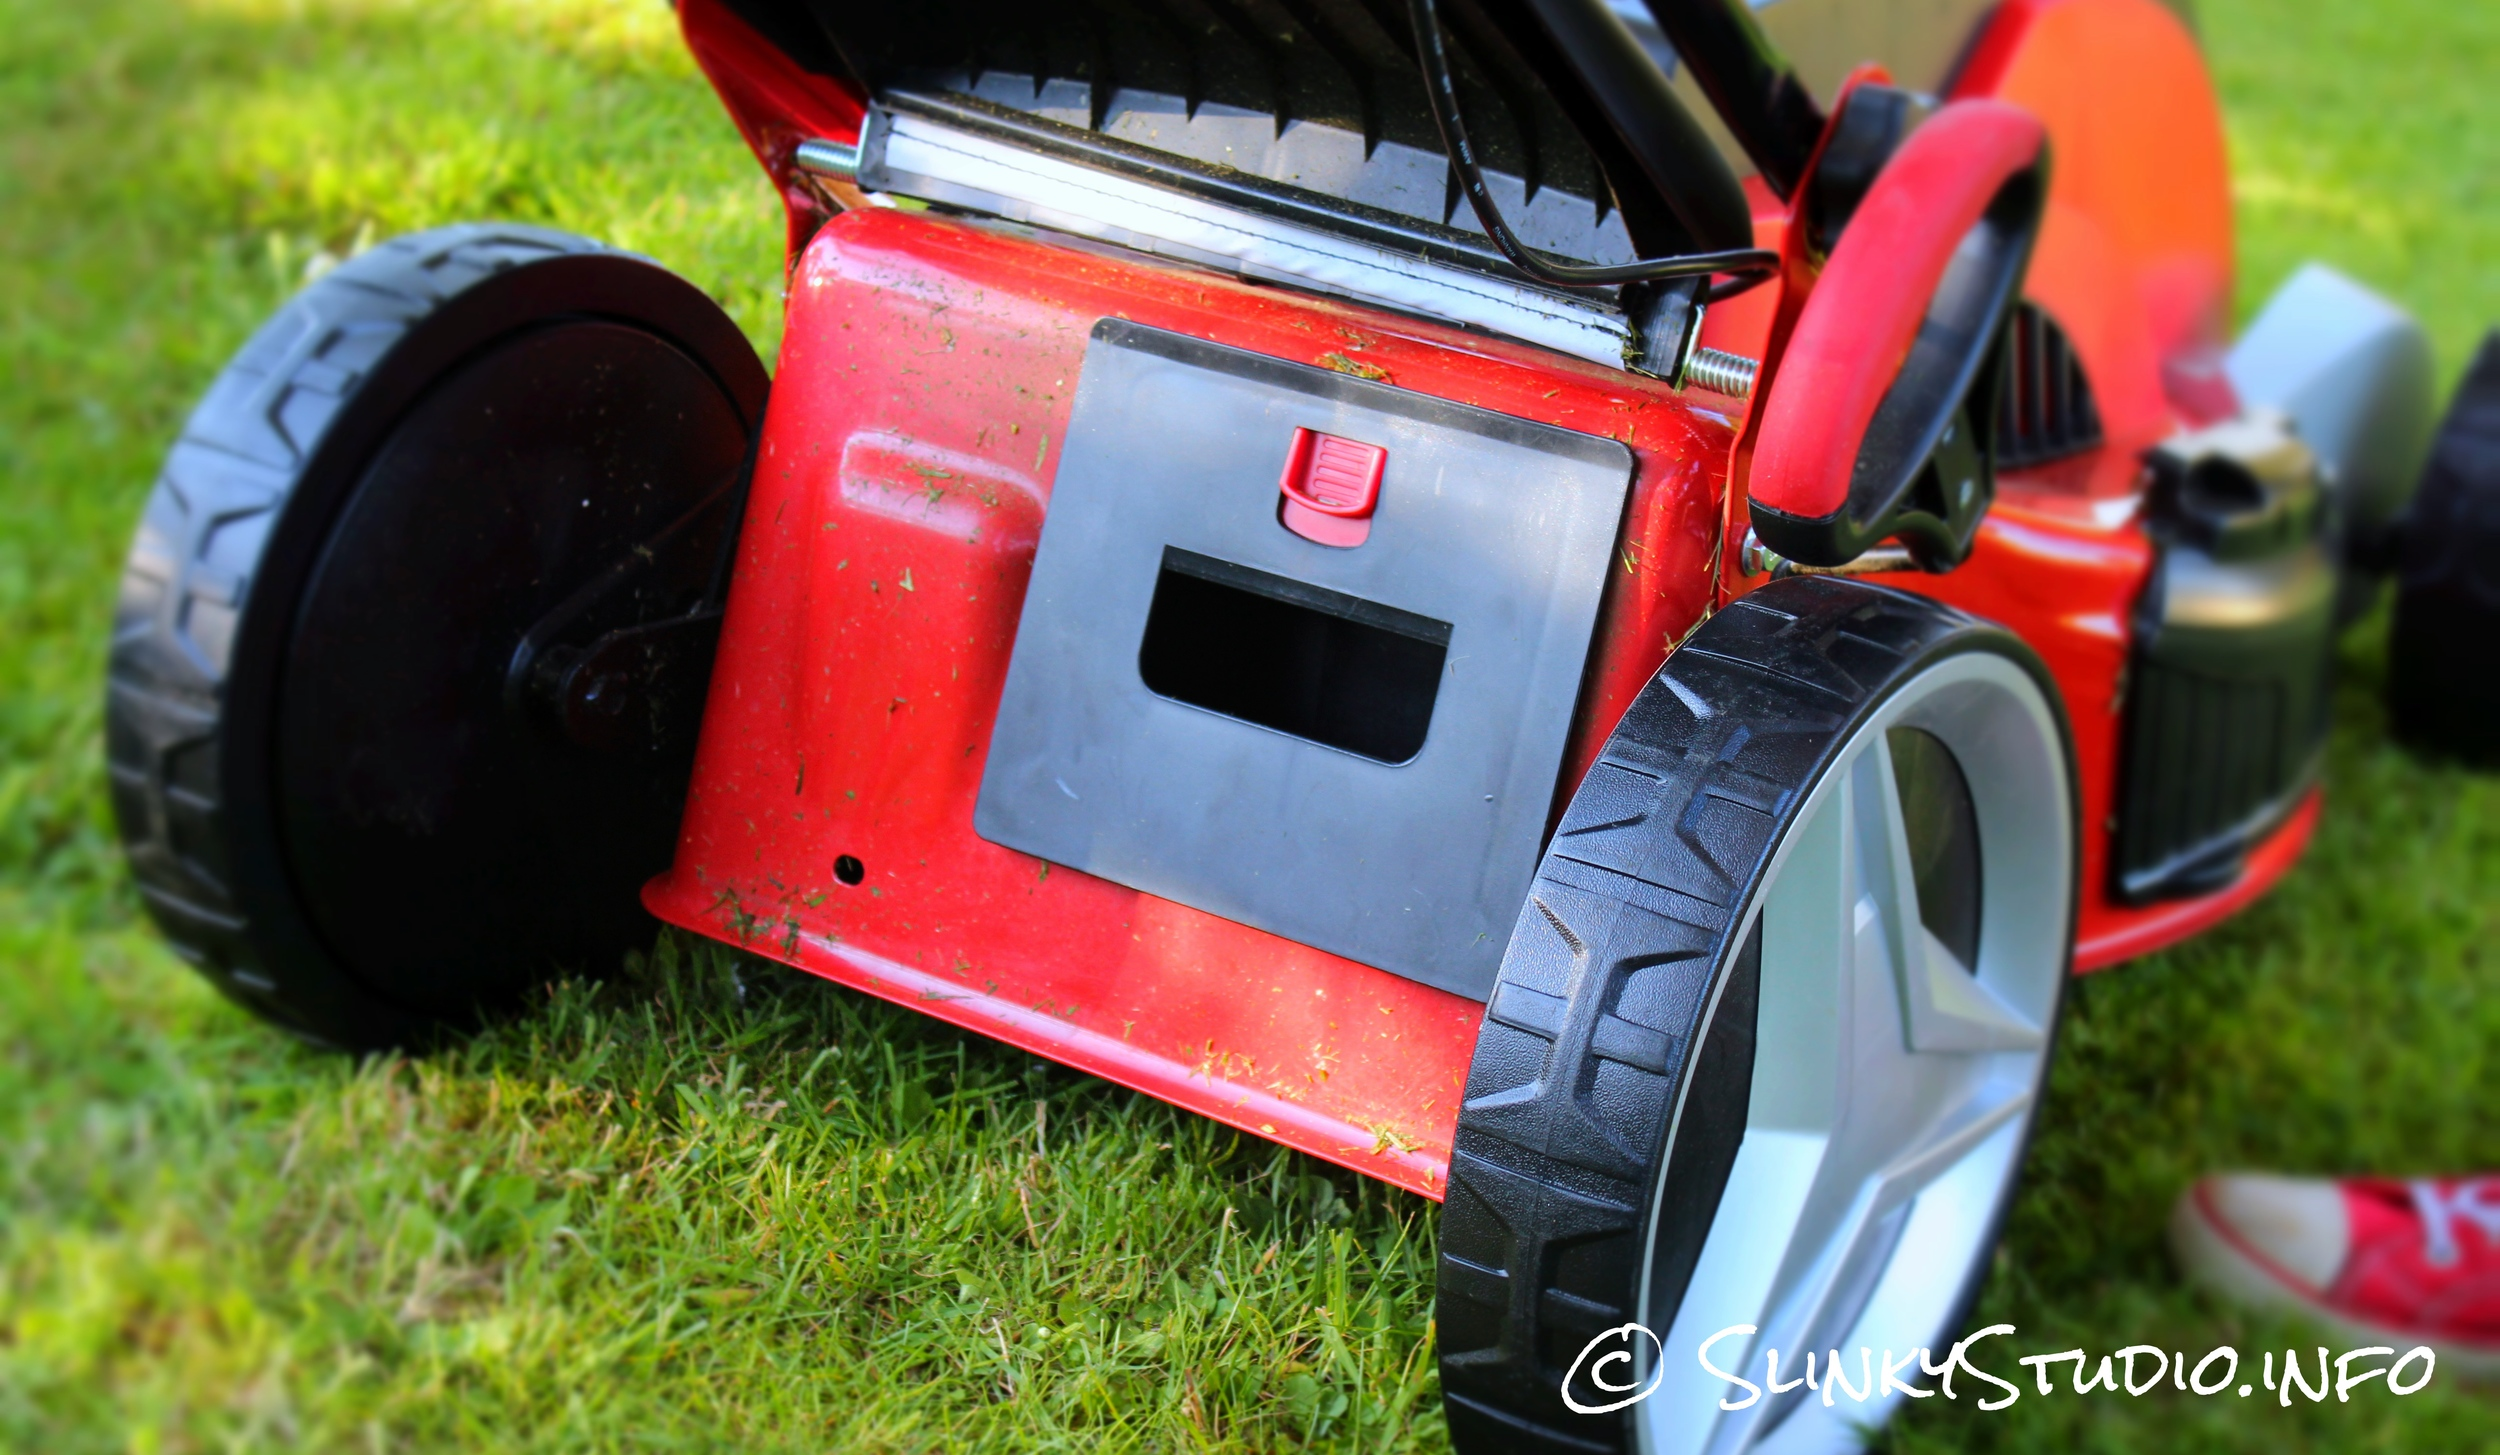 Cobra MX46S40V Cordless Lawnmower Mulching Plug